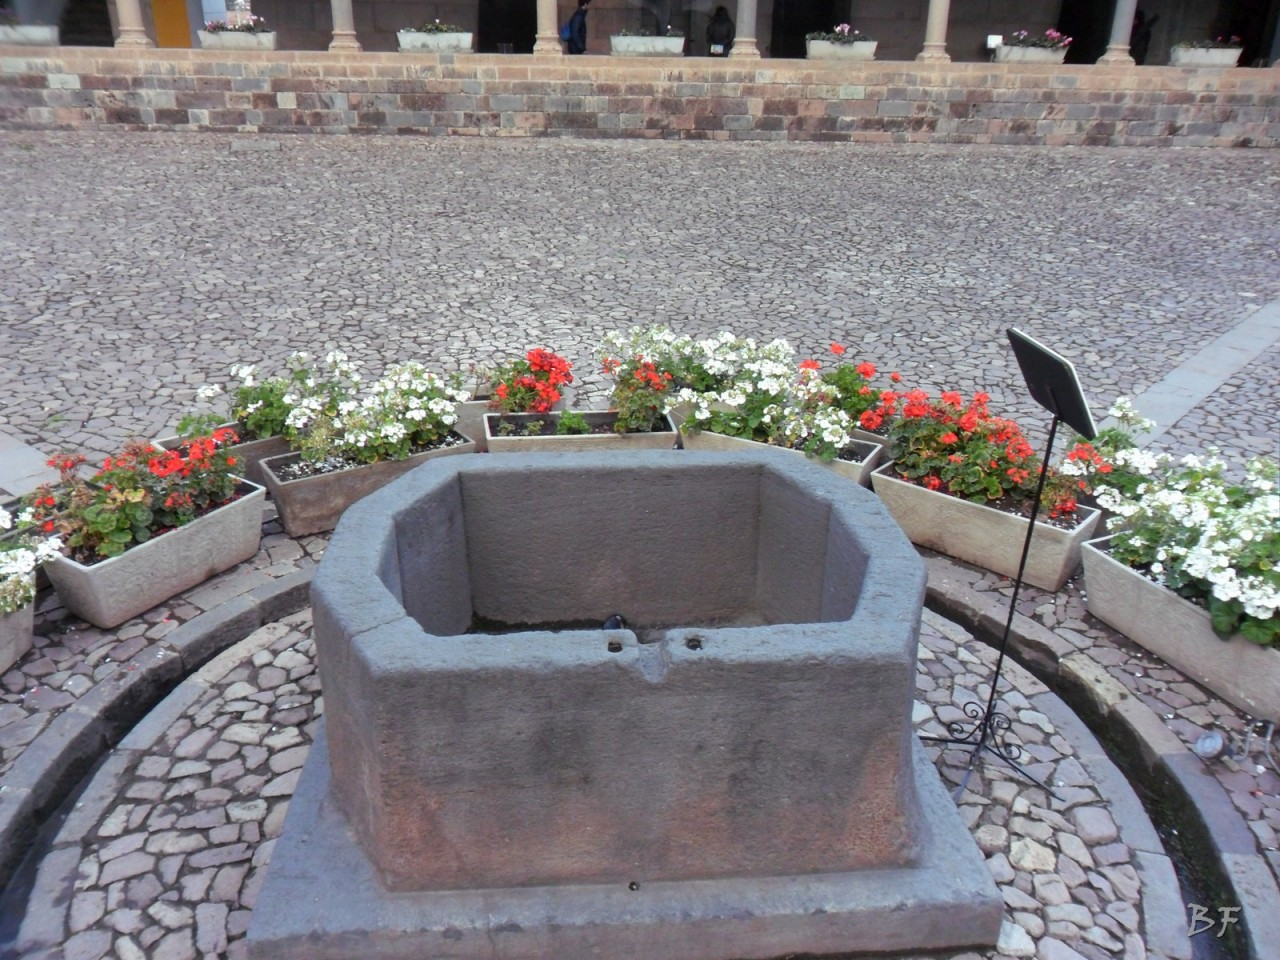 Mura-Poligonali-Megaliti-Tempio-Coricancha-Cusco-Perù-44